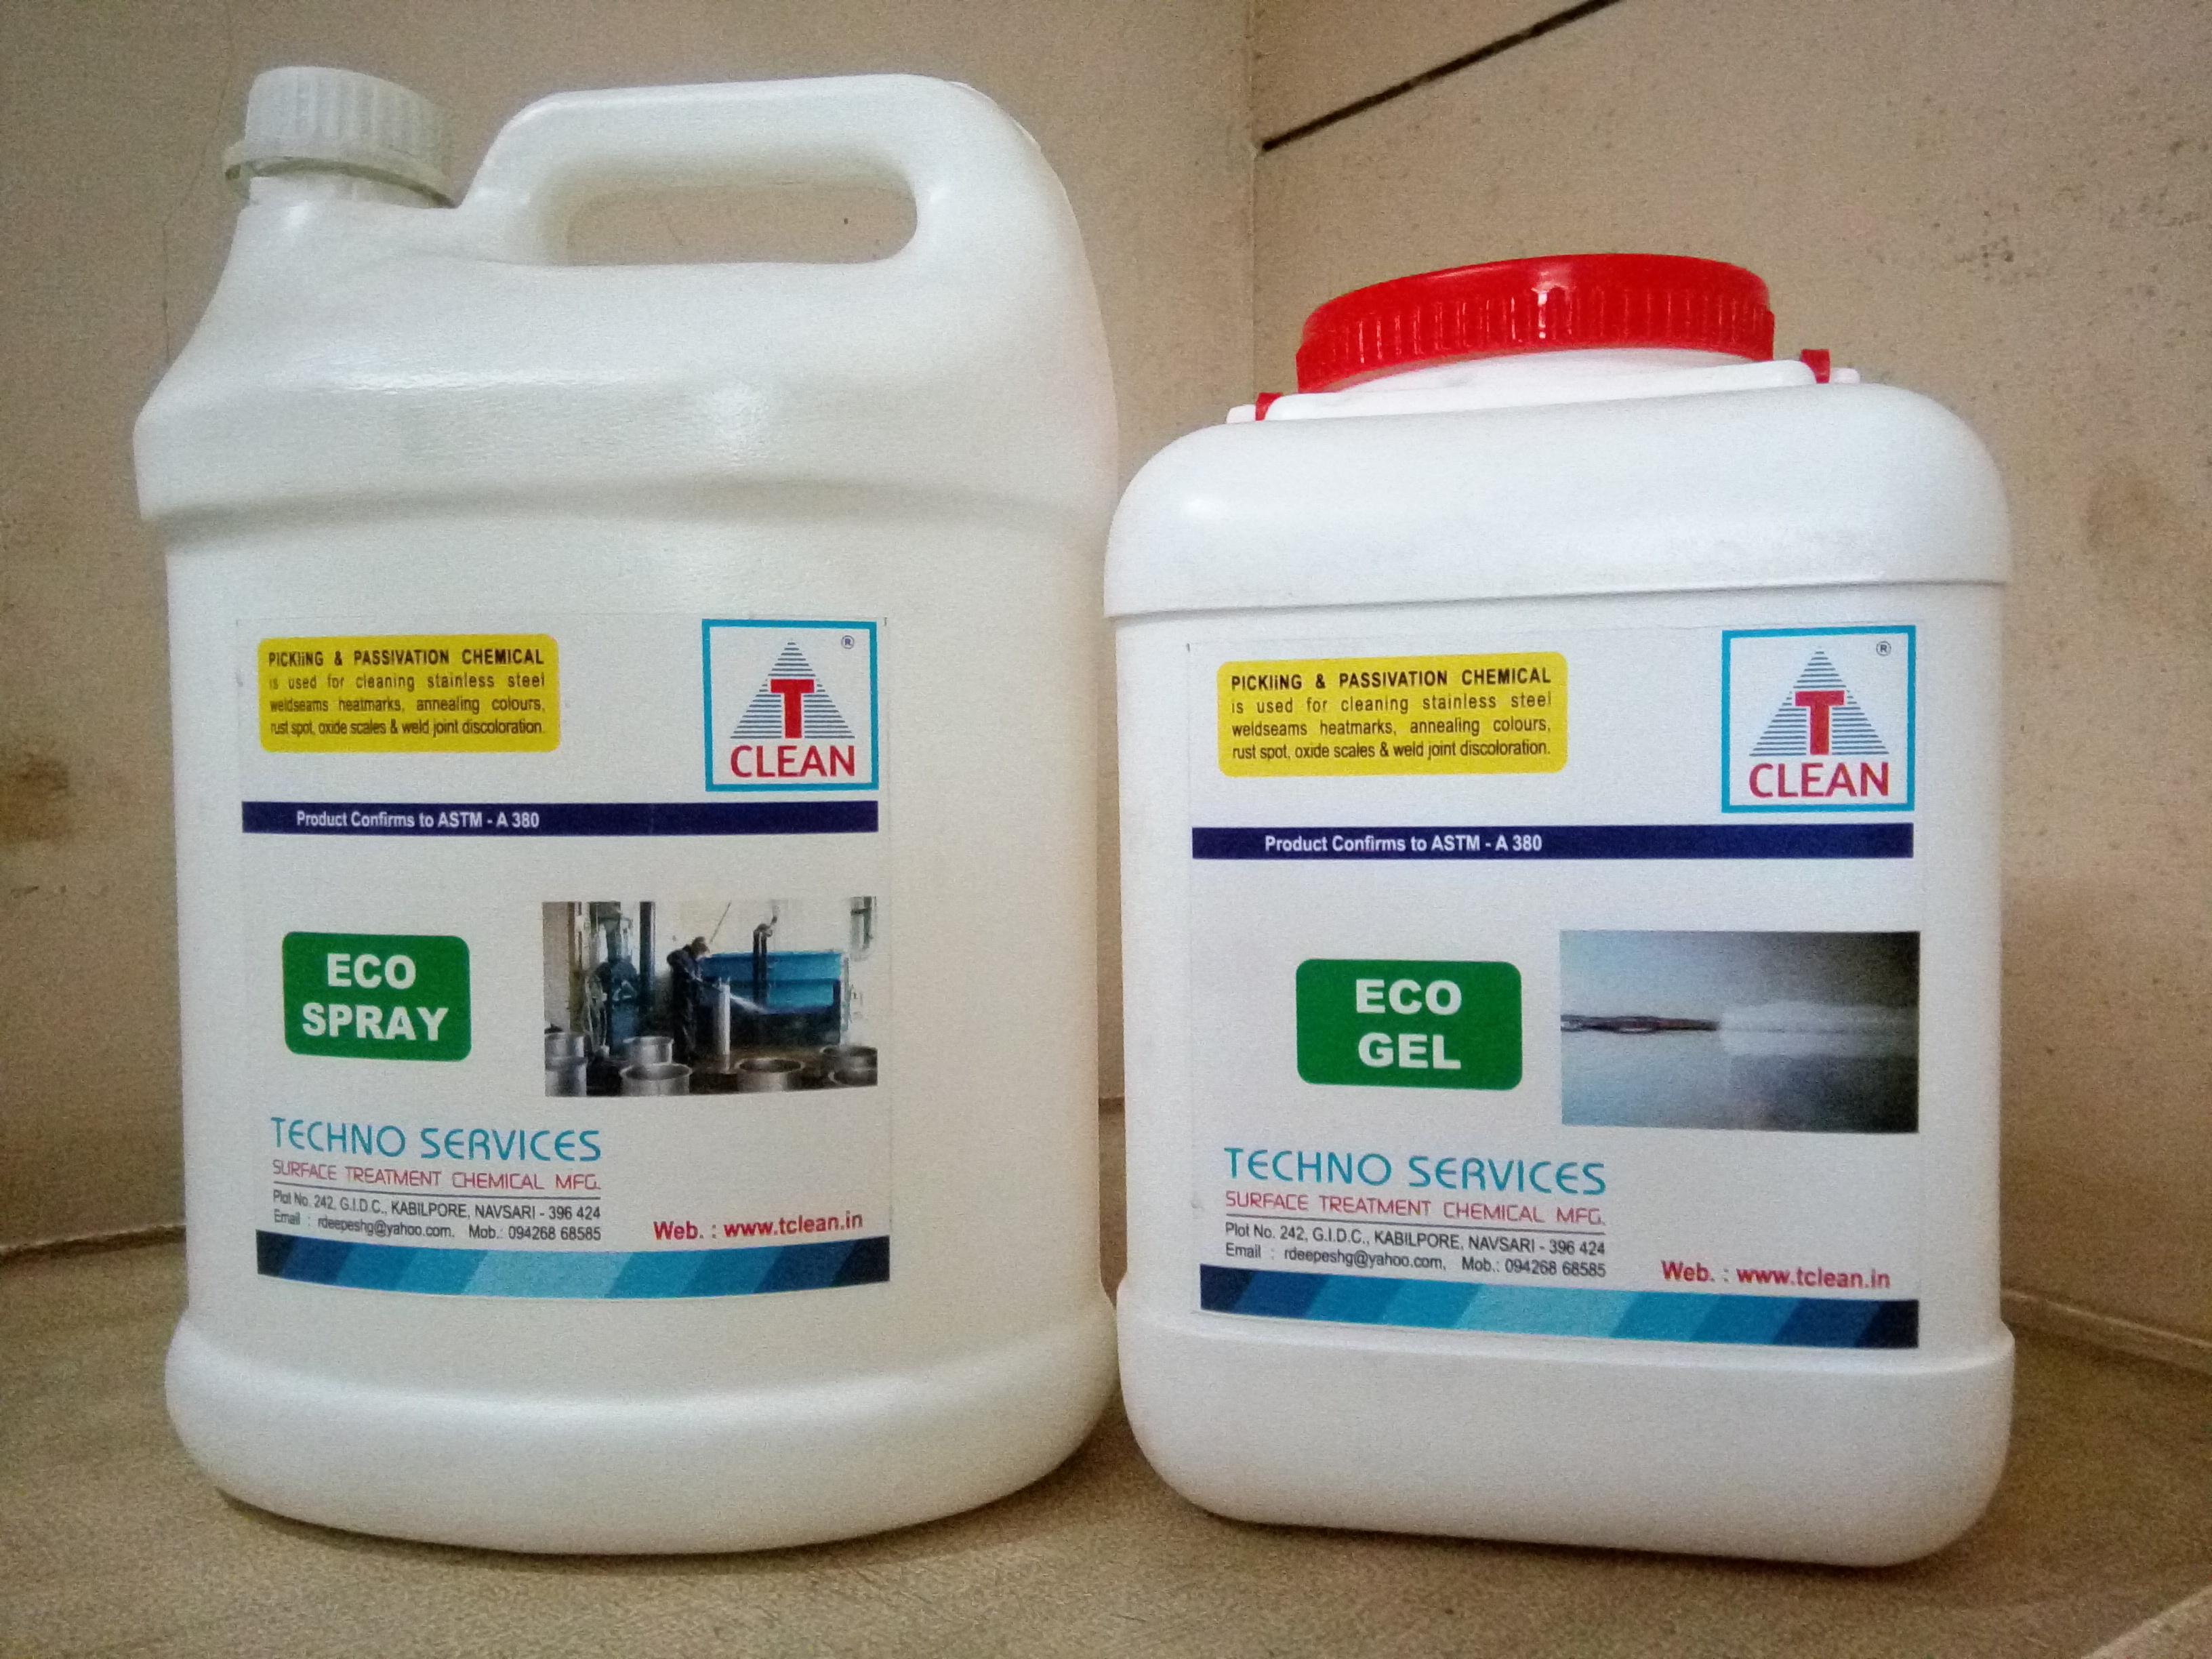 Bio Chemical product Eco Gel